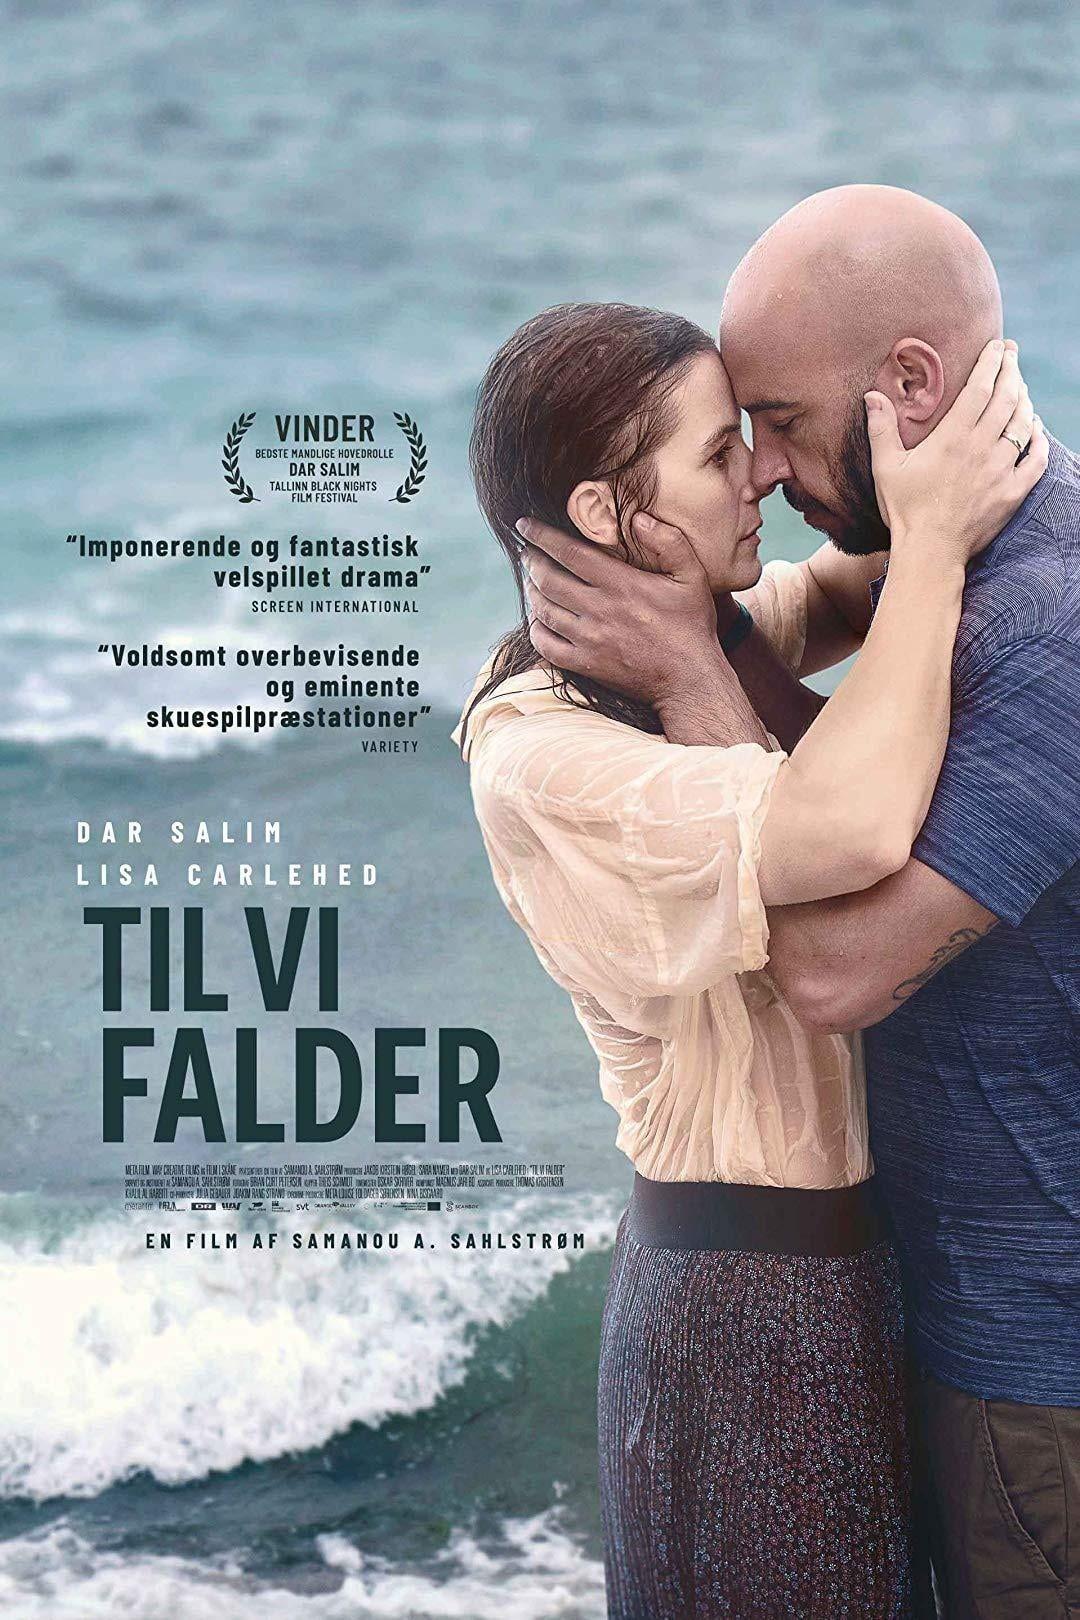 Til Vi Falder 2019 Streaming Ita Cb01 Film Completo Italiano Altadefinizione Full Movies Movies Online Movies To Watch